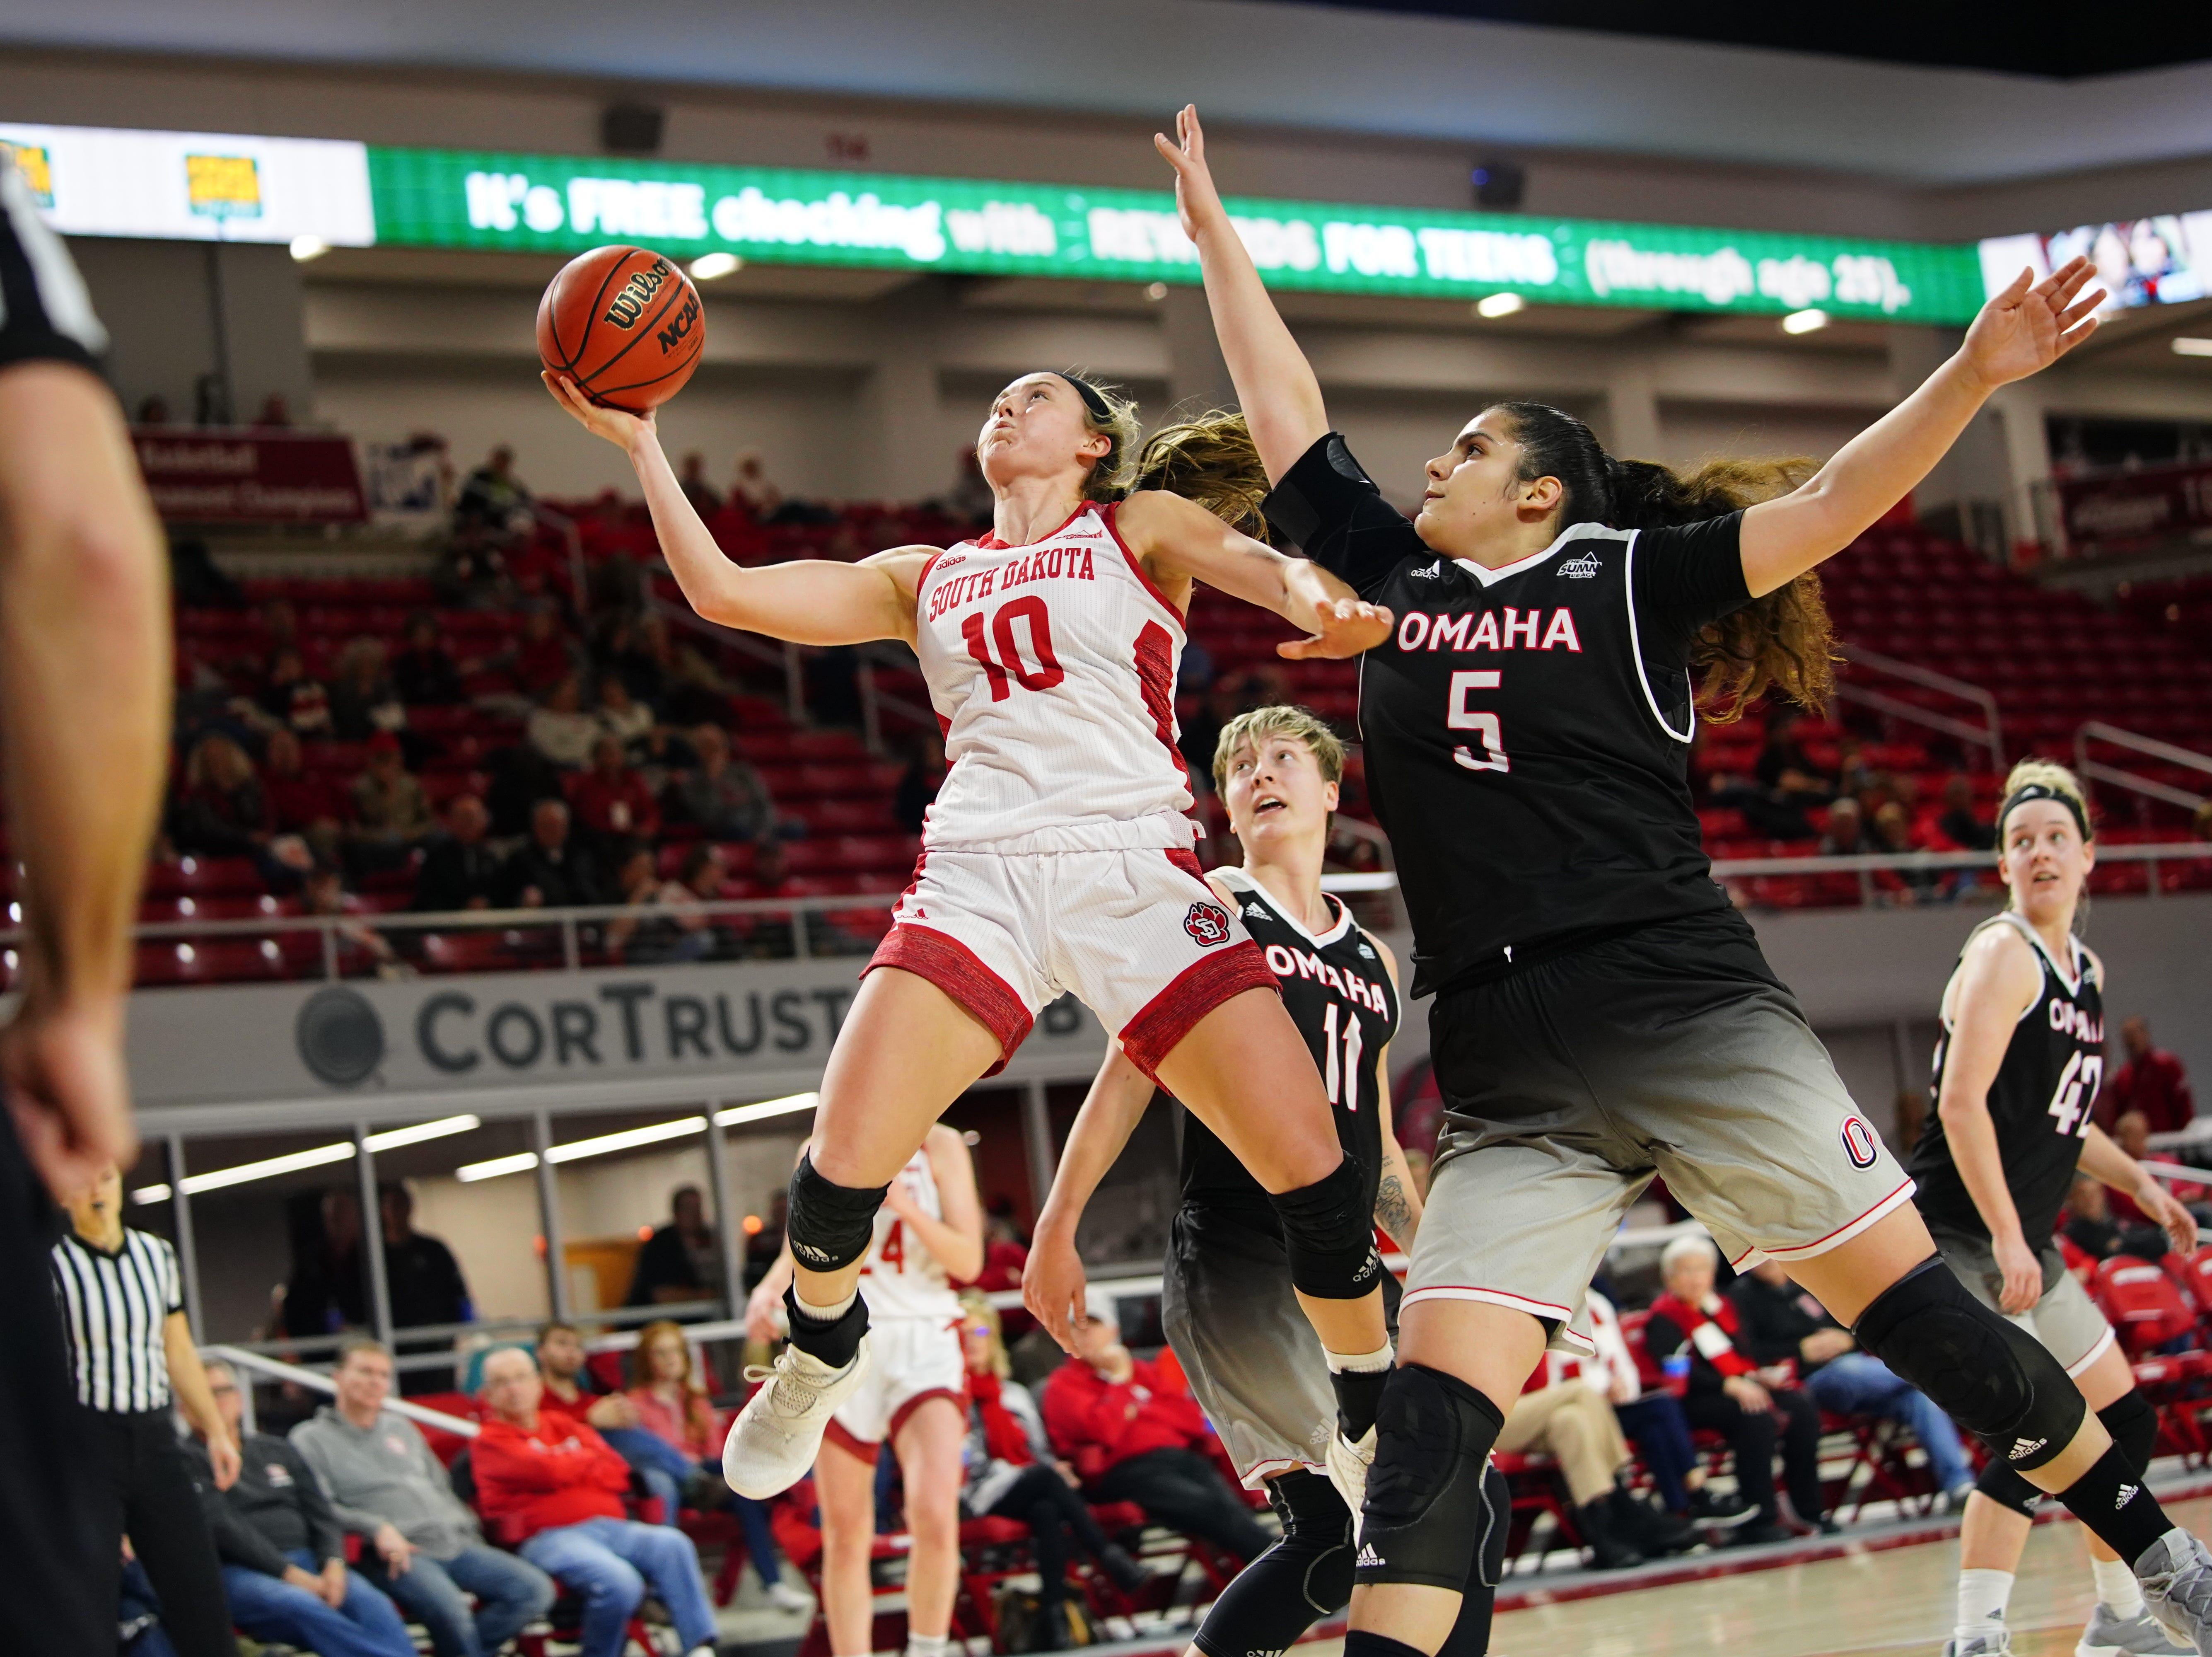 South Dakota guard Allison Arens drives to the basket against Omaha on Feb. 6, 2019.